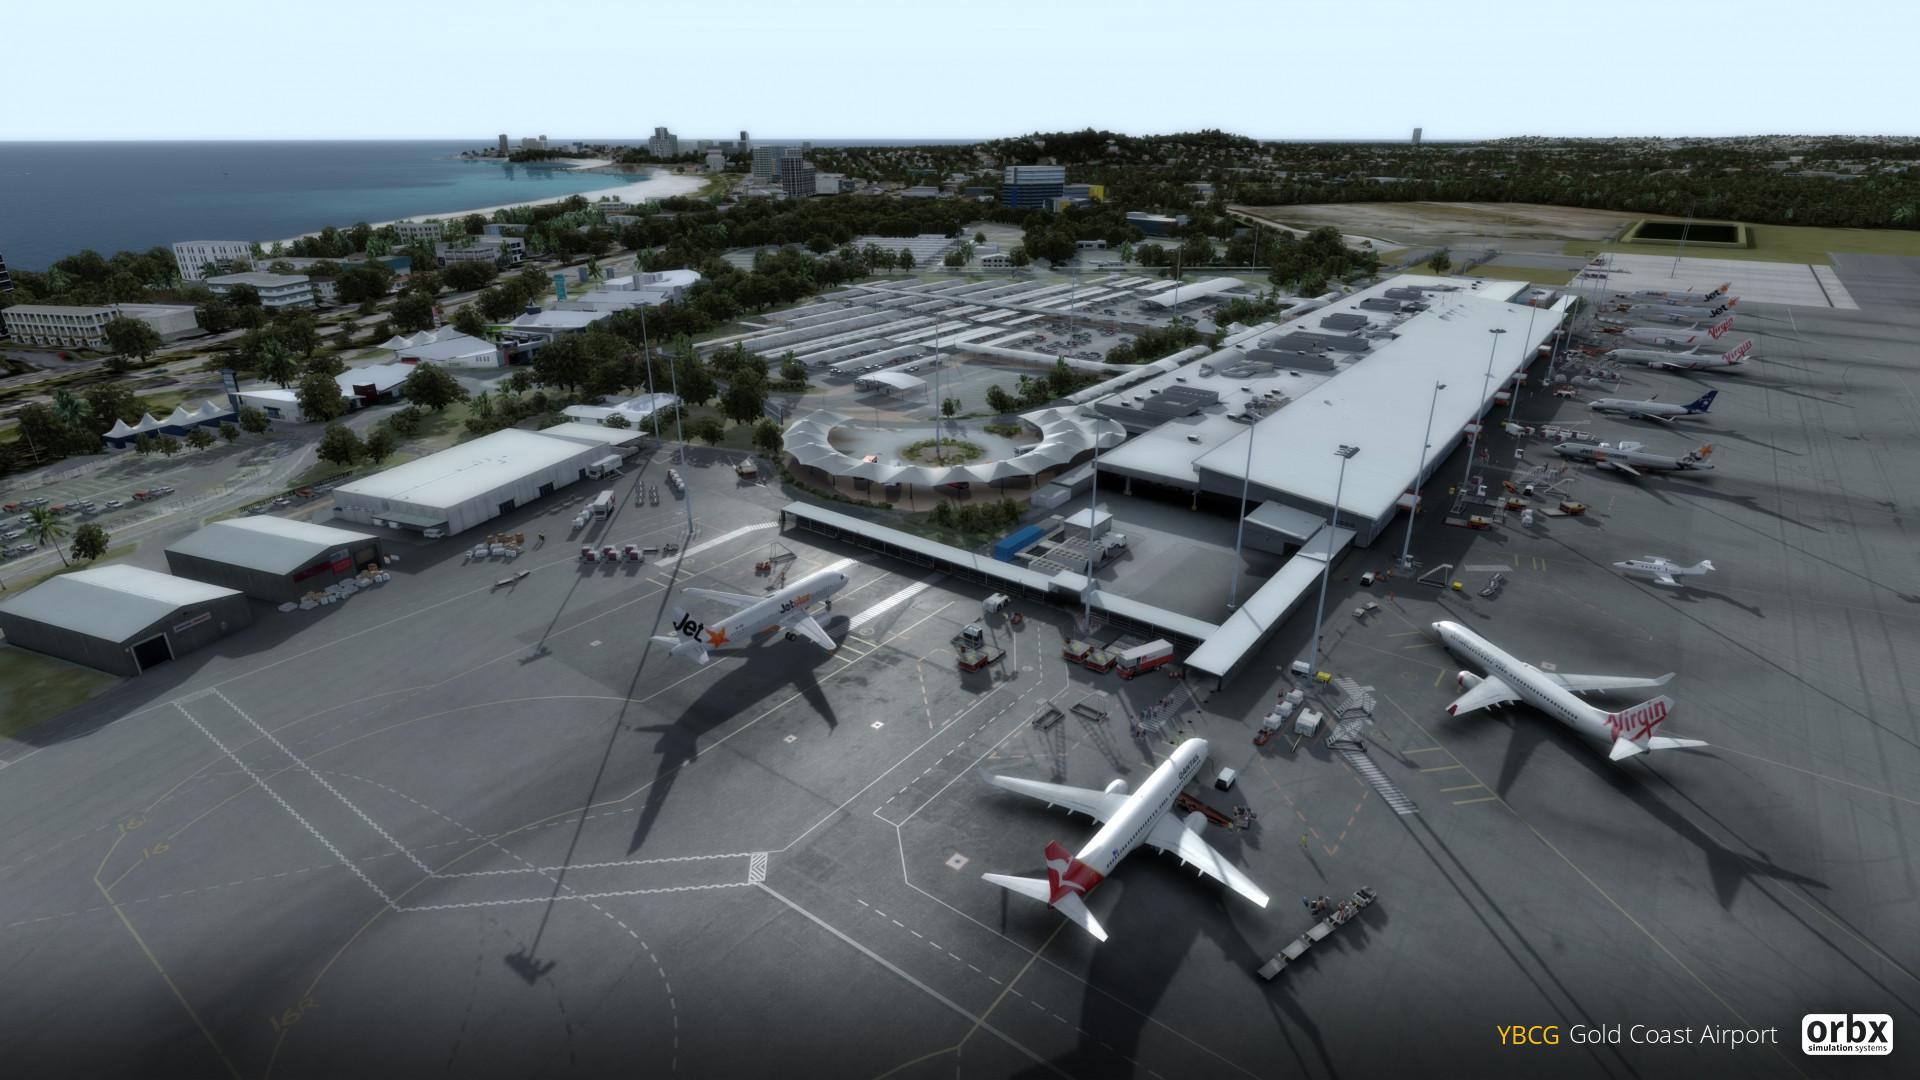 YBCG Gold Coast Airport